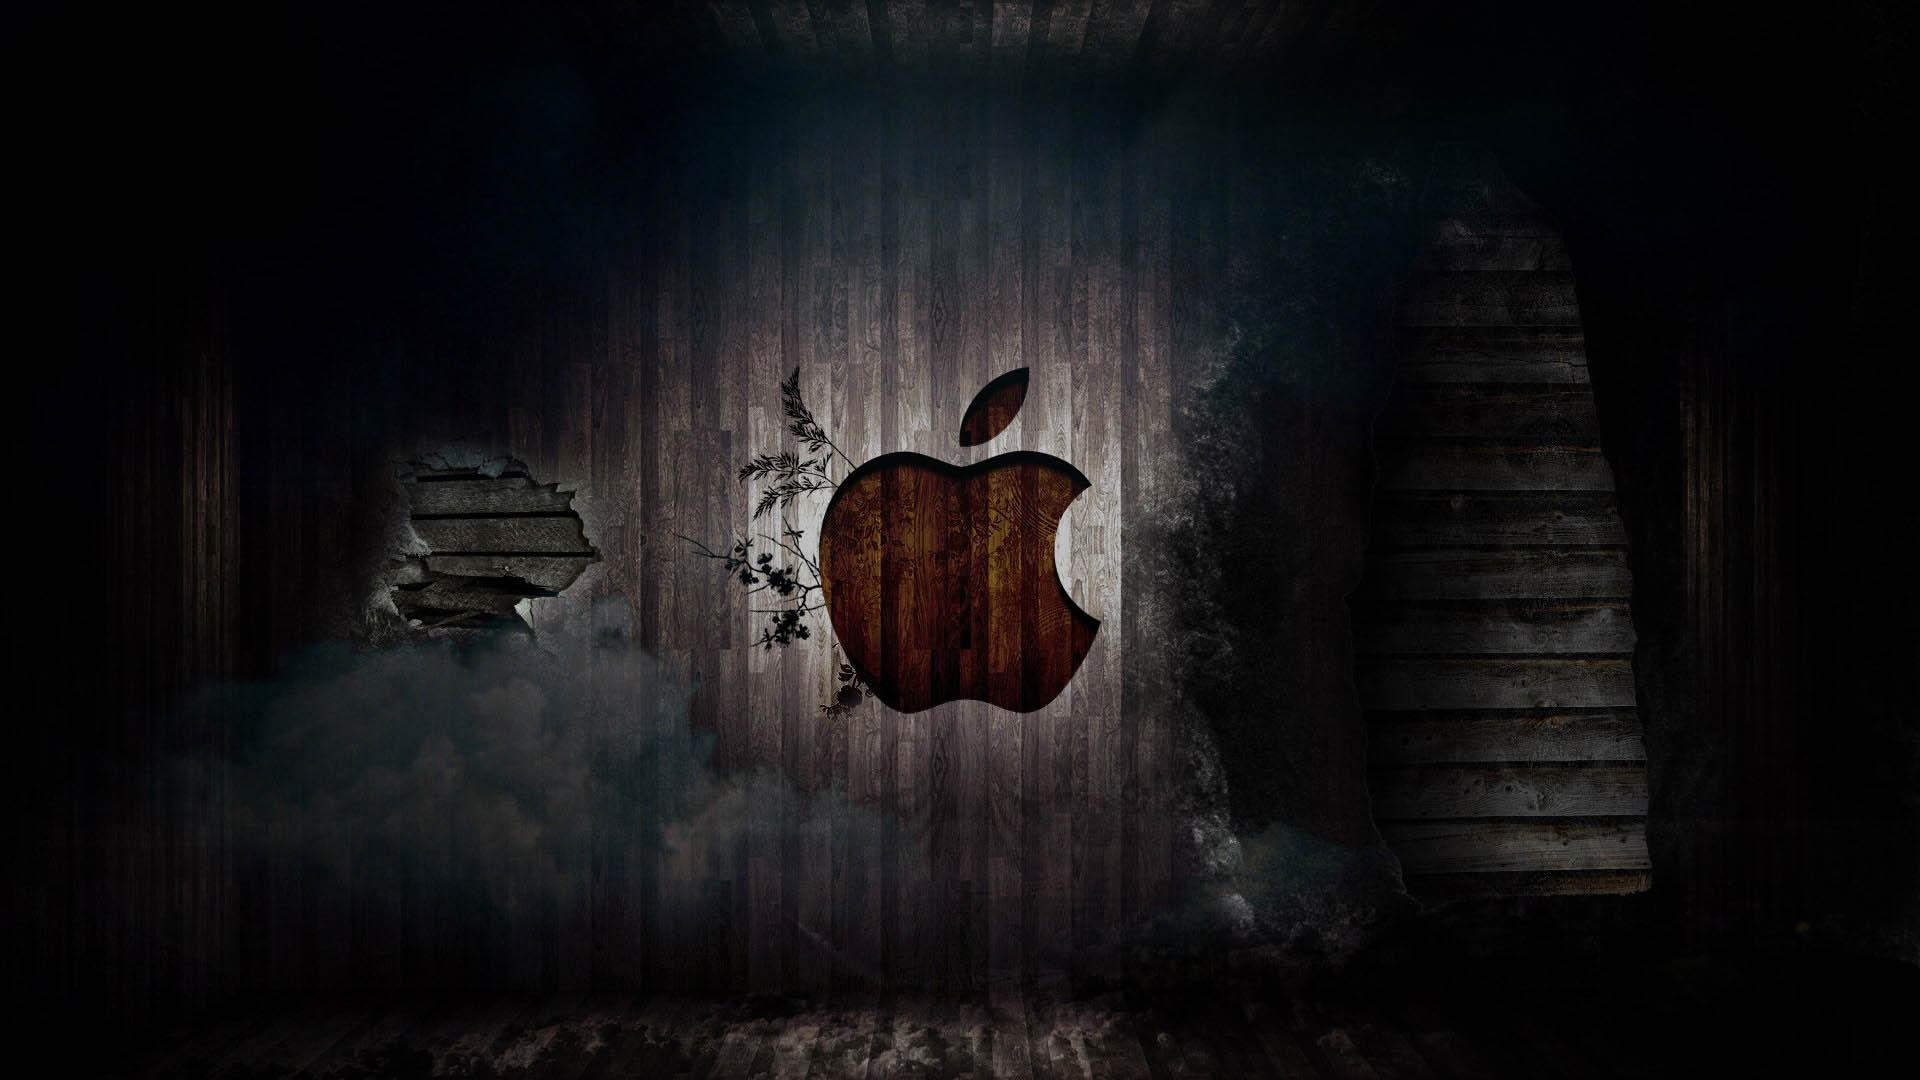 Deviantart-Mac-Free-Neo-wallpaper-wp34012074